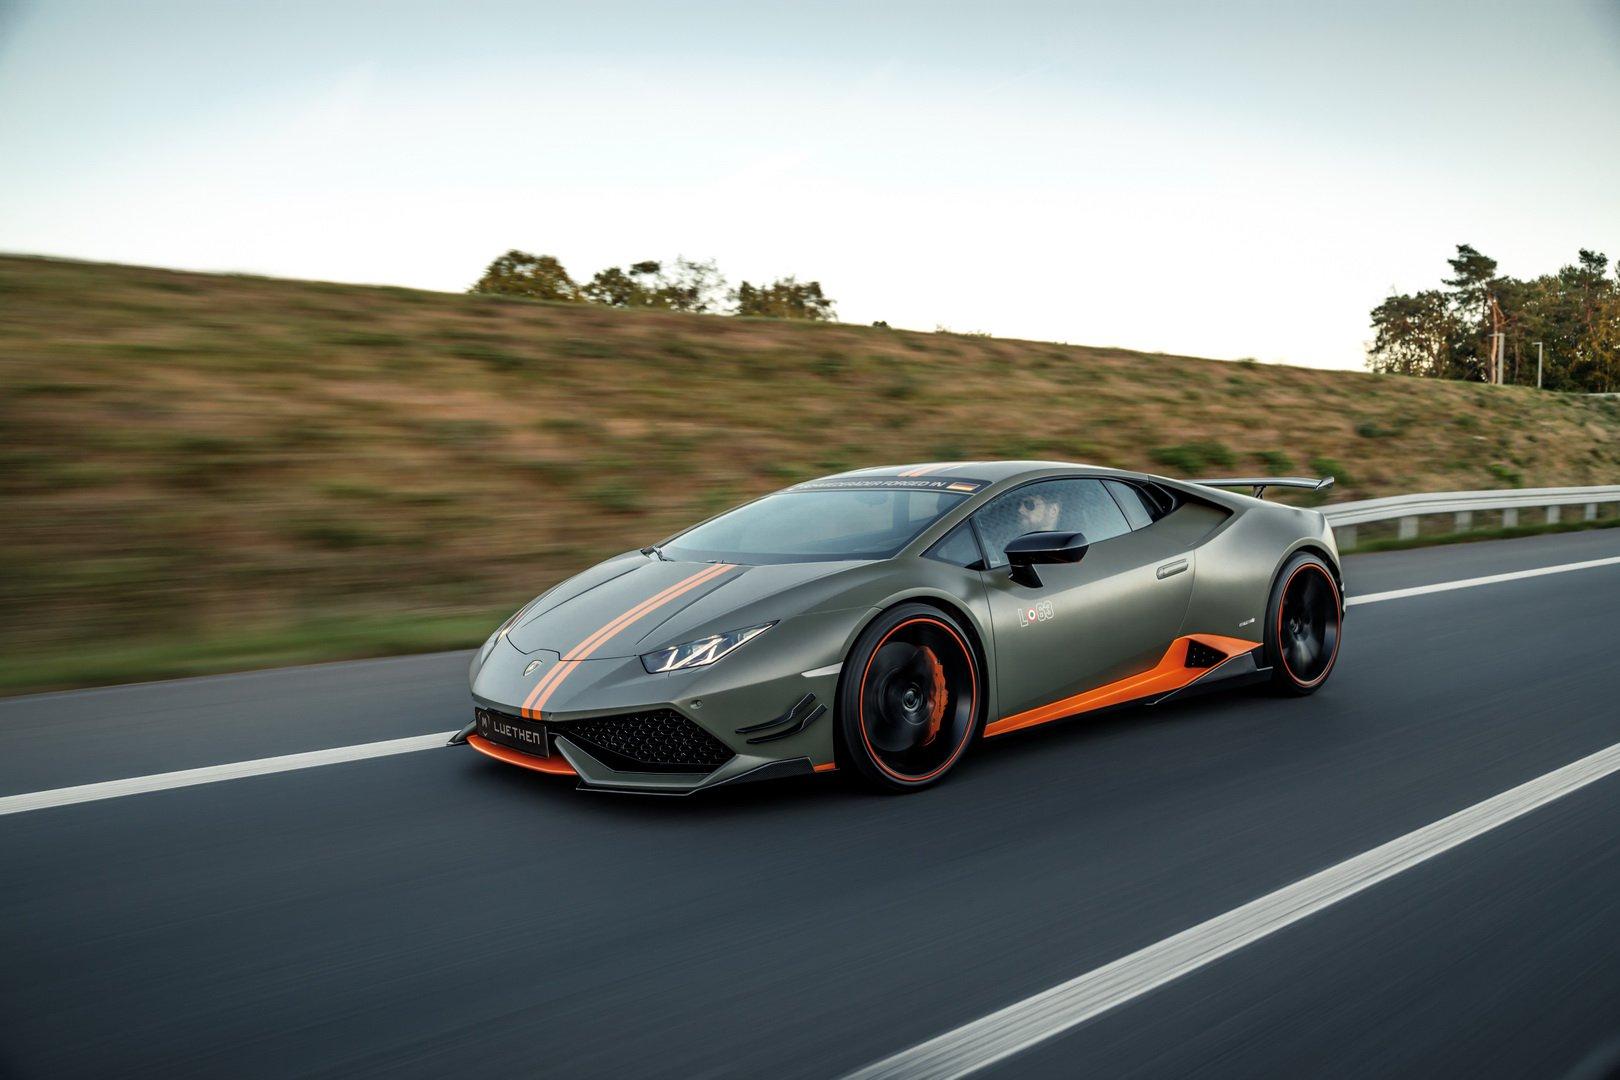 Tuner Customizes Lamborghini Huracan Avio